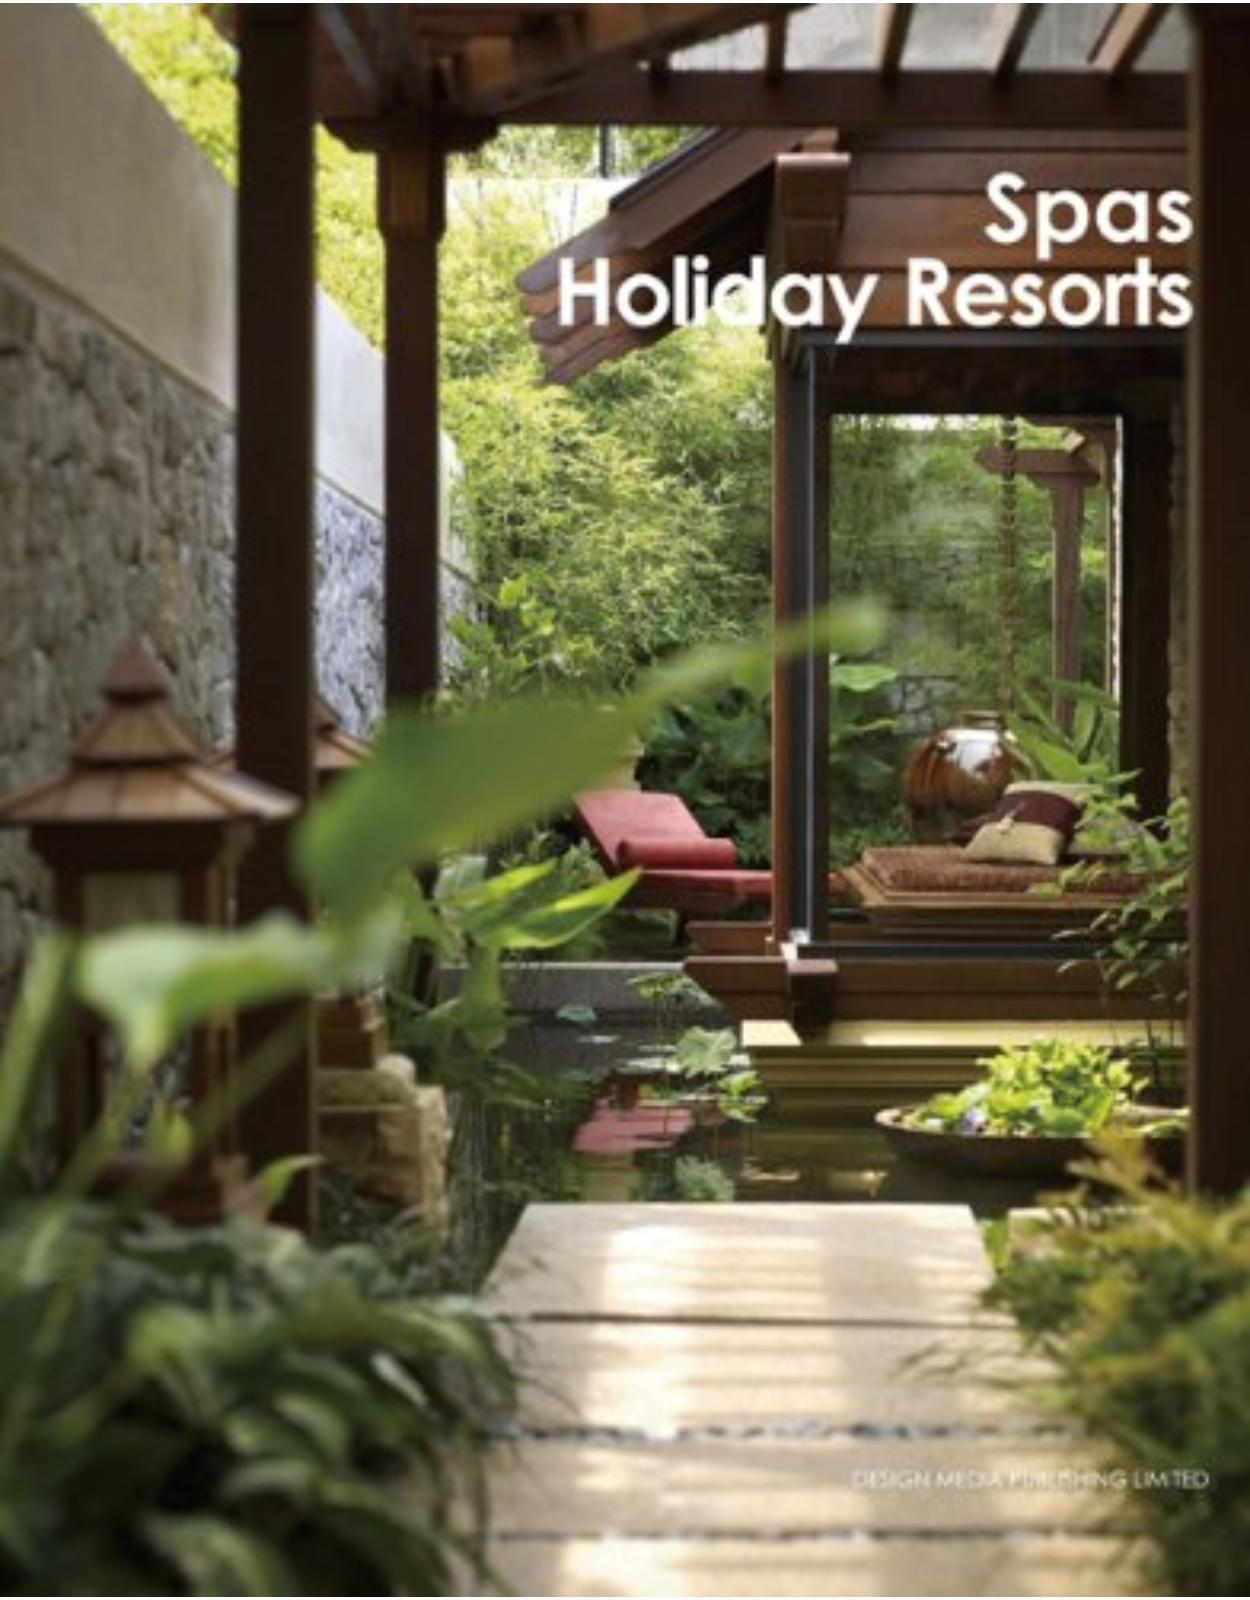 Spas and Holiday Resorts